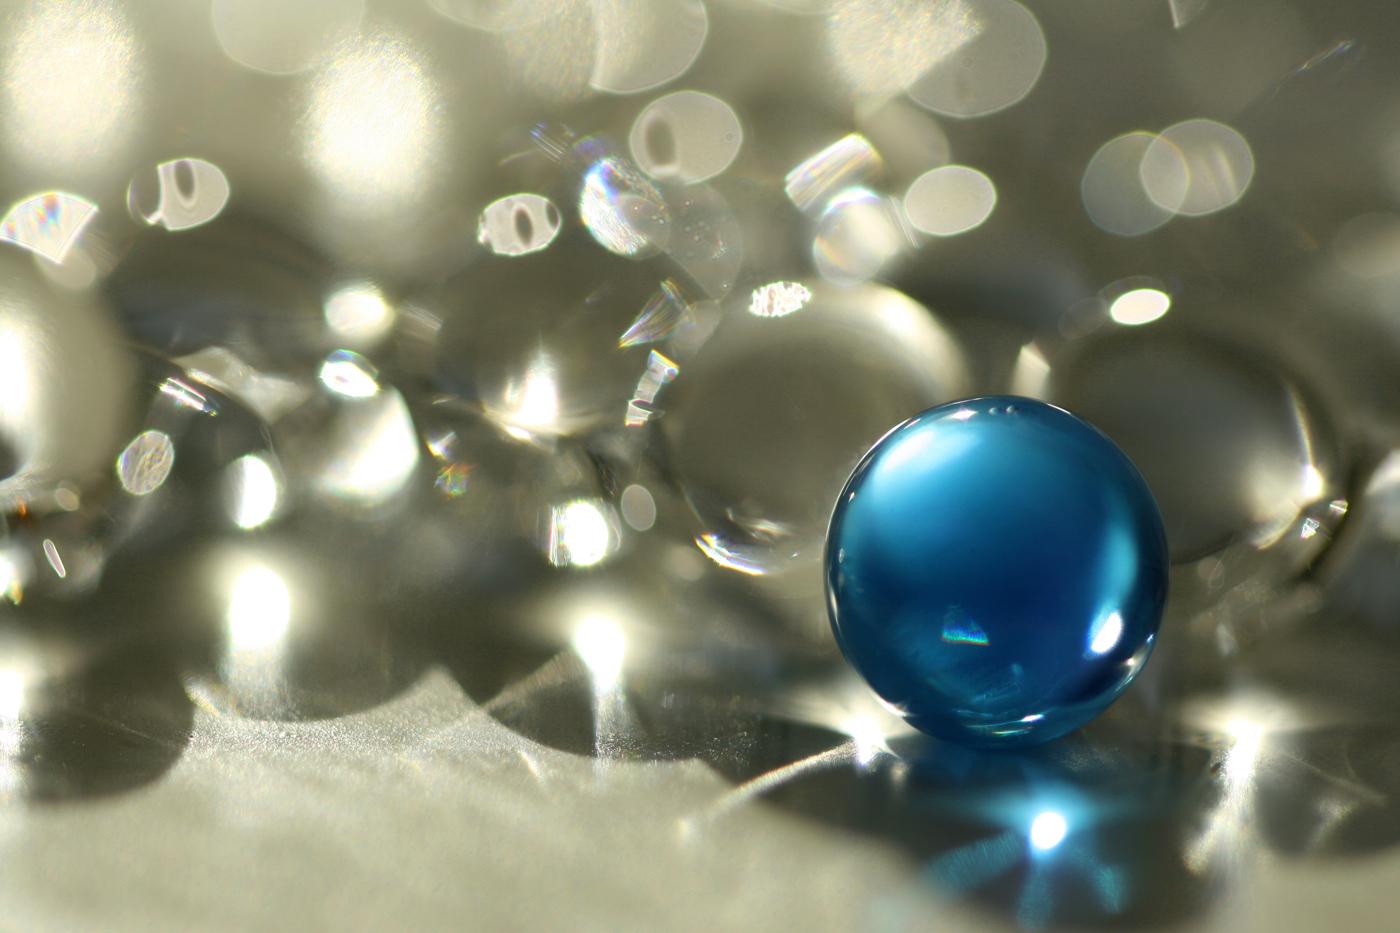 'Sphere' by Tony O'Reilly